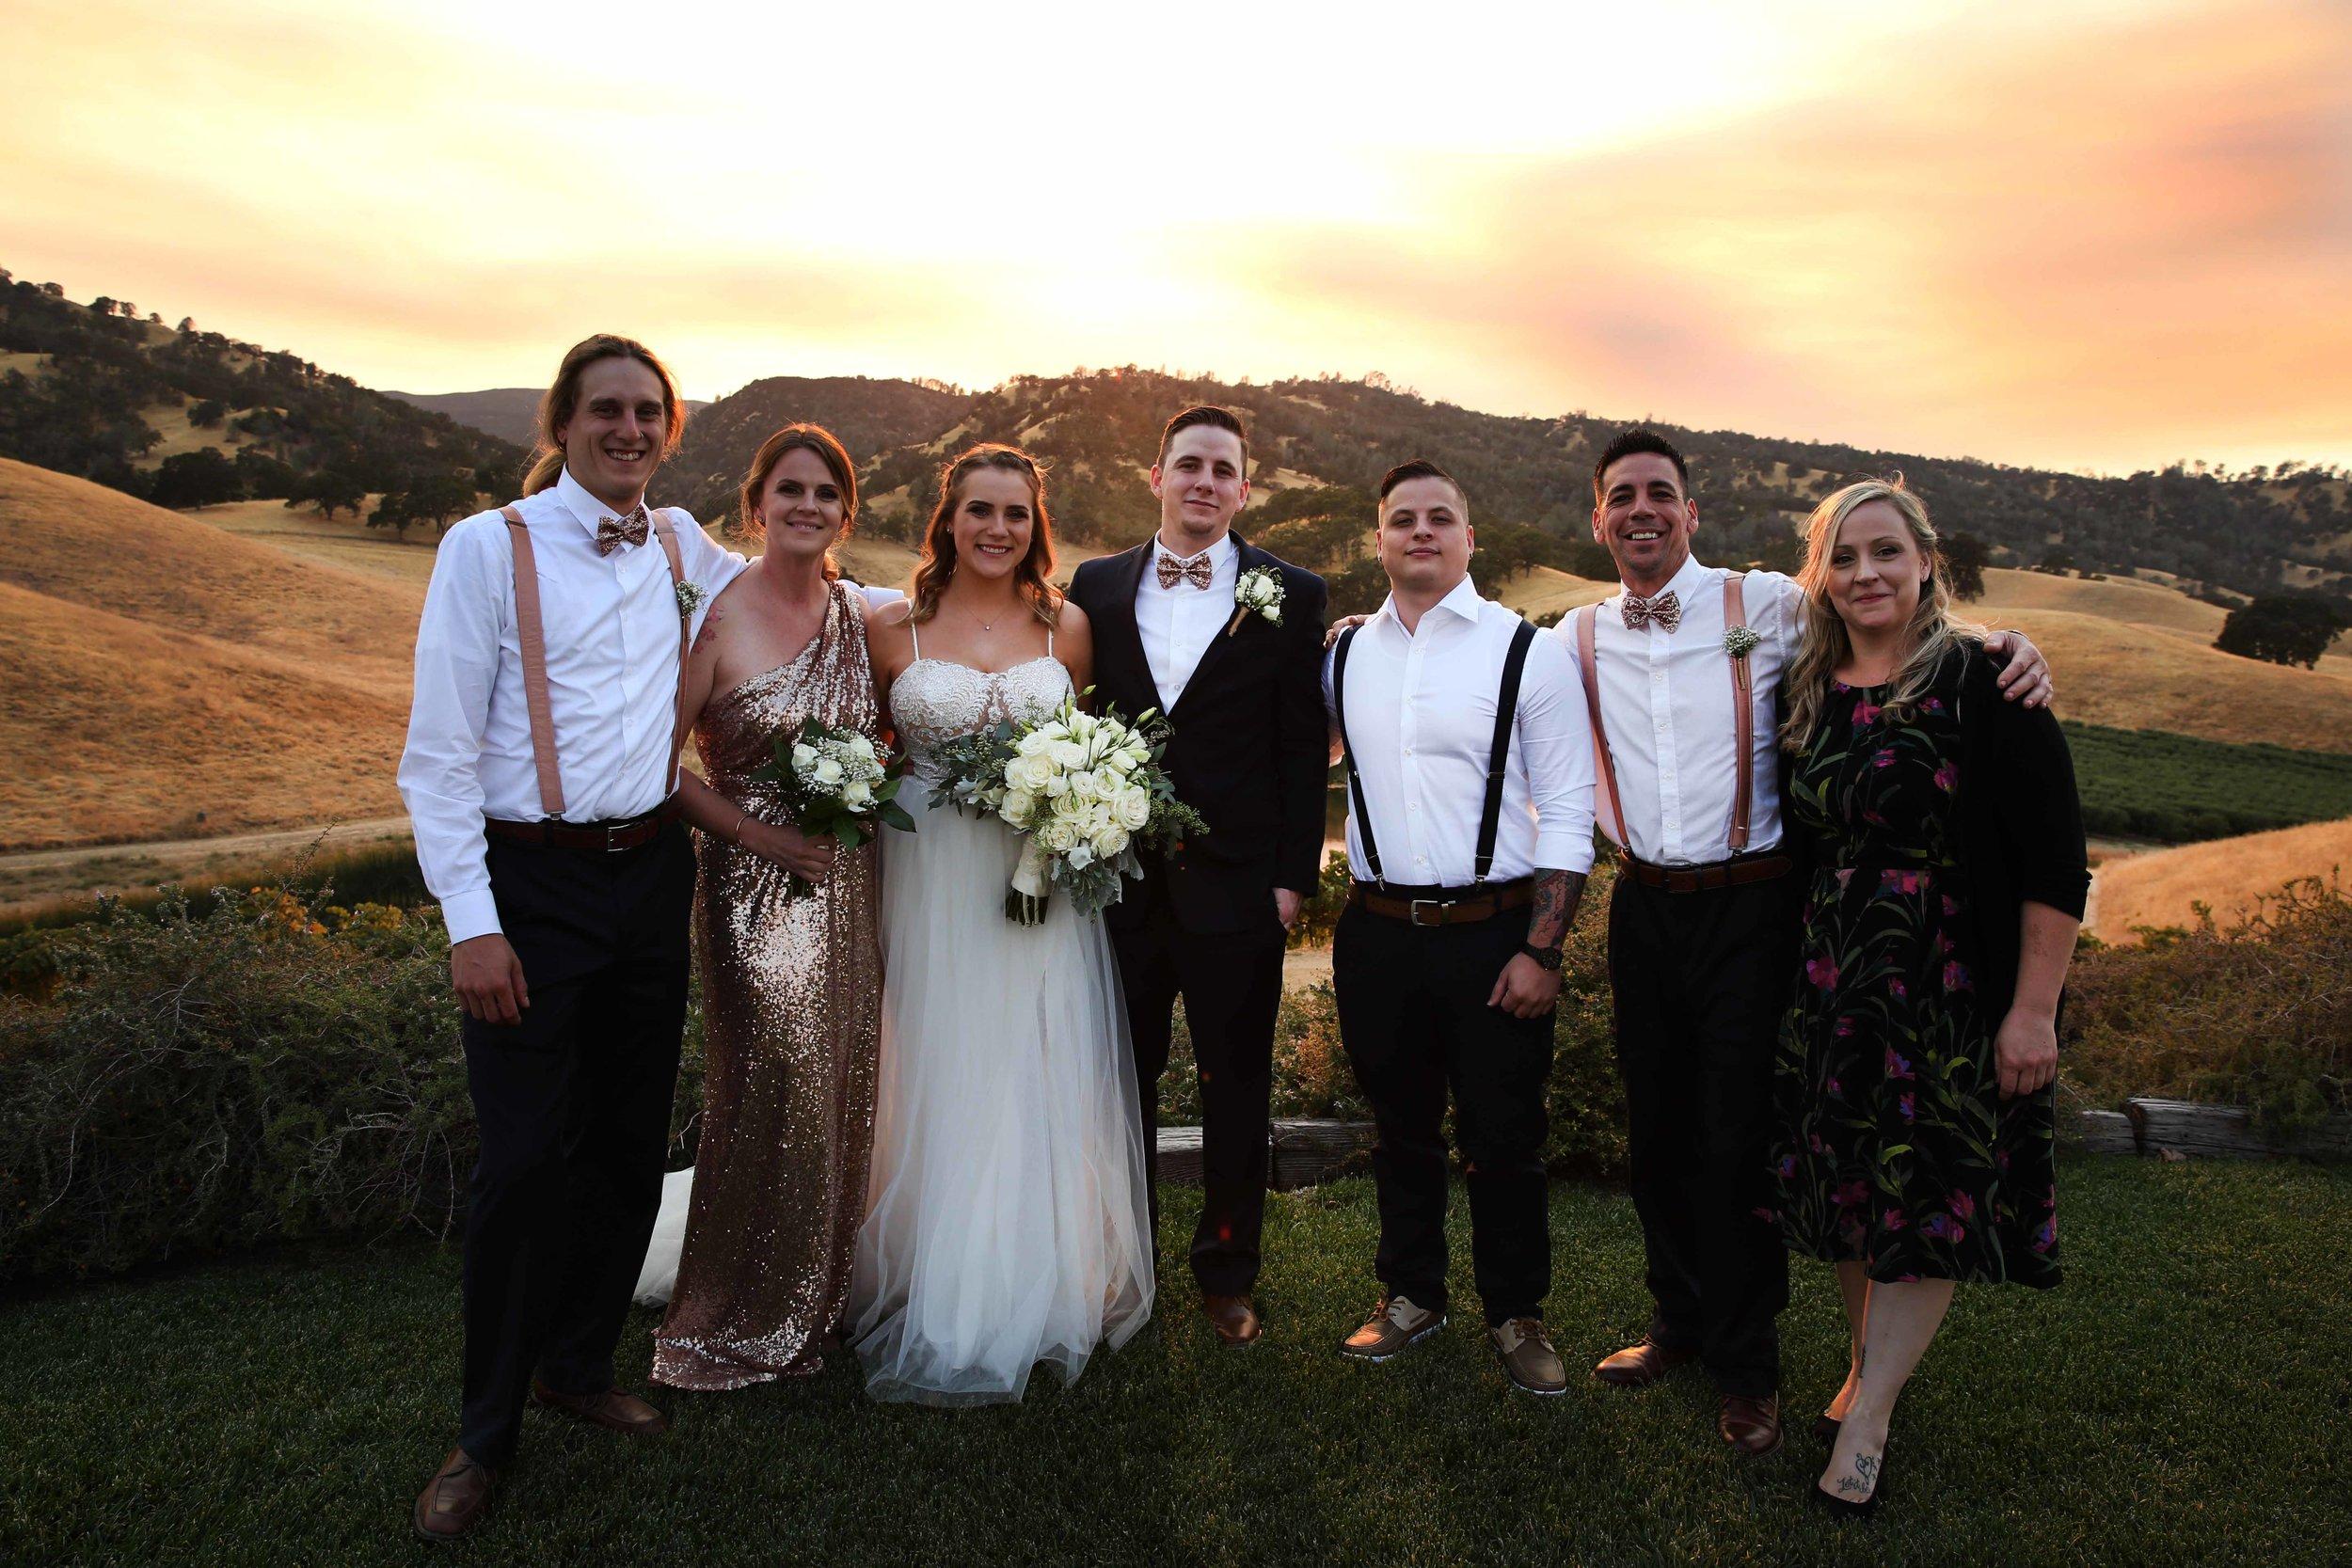 wedding photographs lodi capay valley.jpg